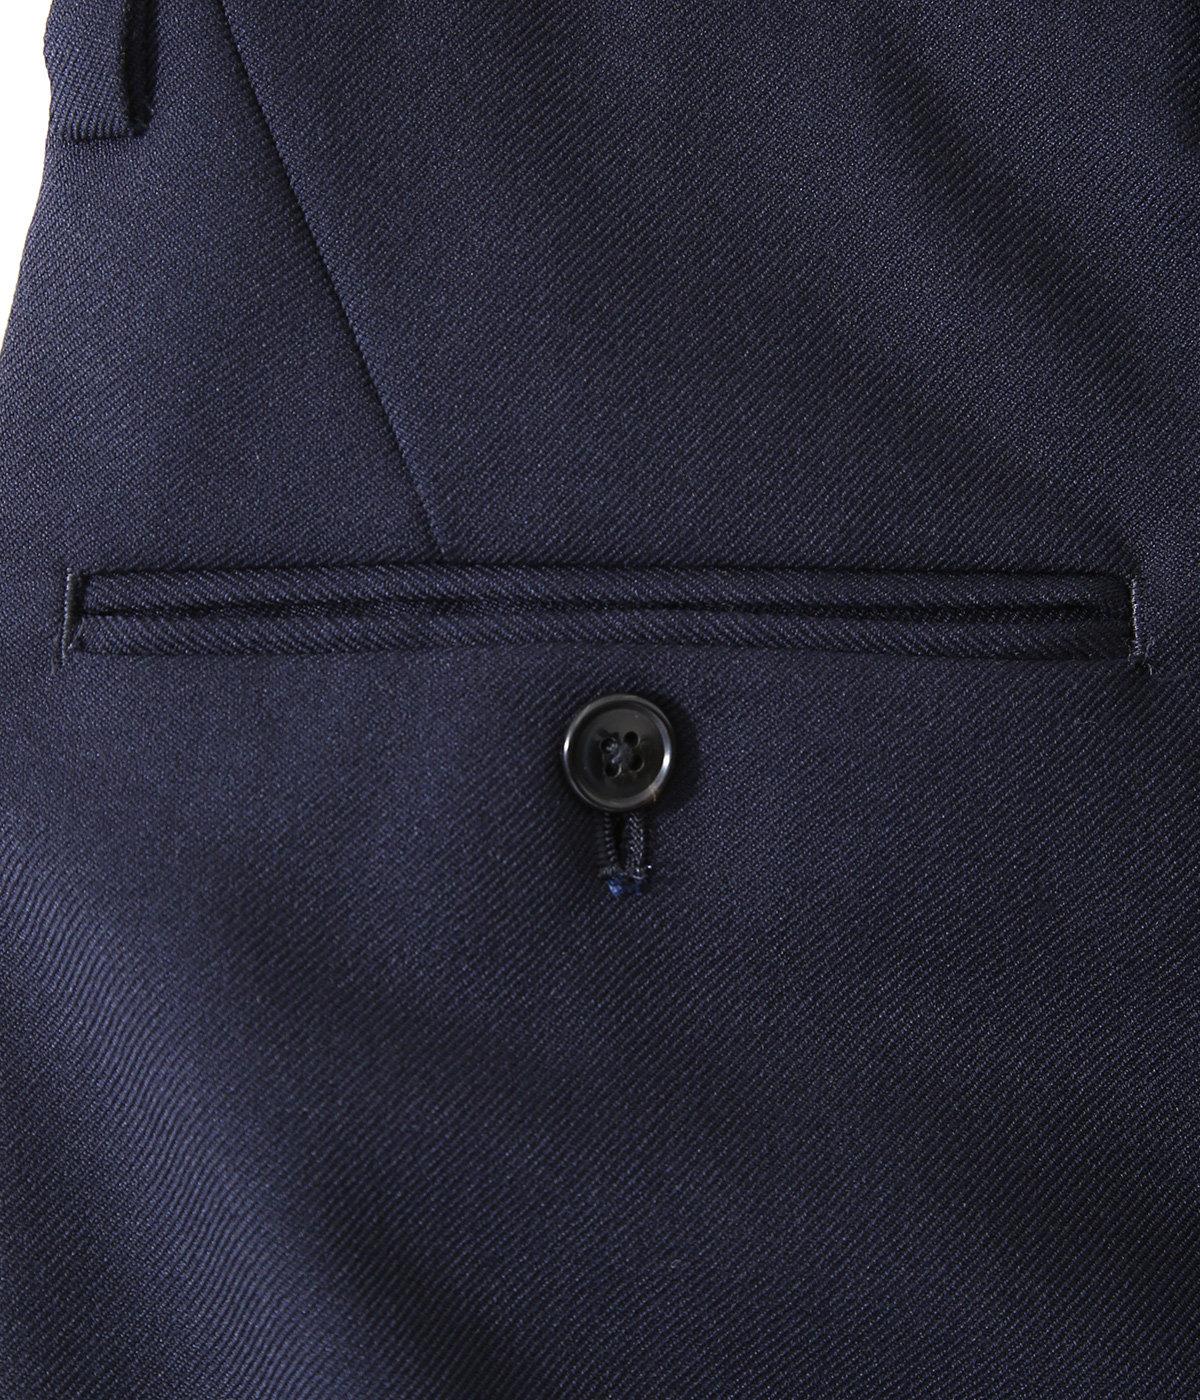 WOOL POLYESTER SERGE / 1 TUCK PANTS